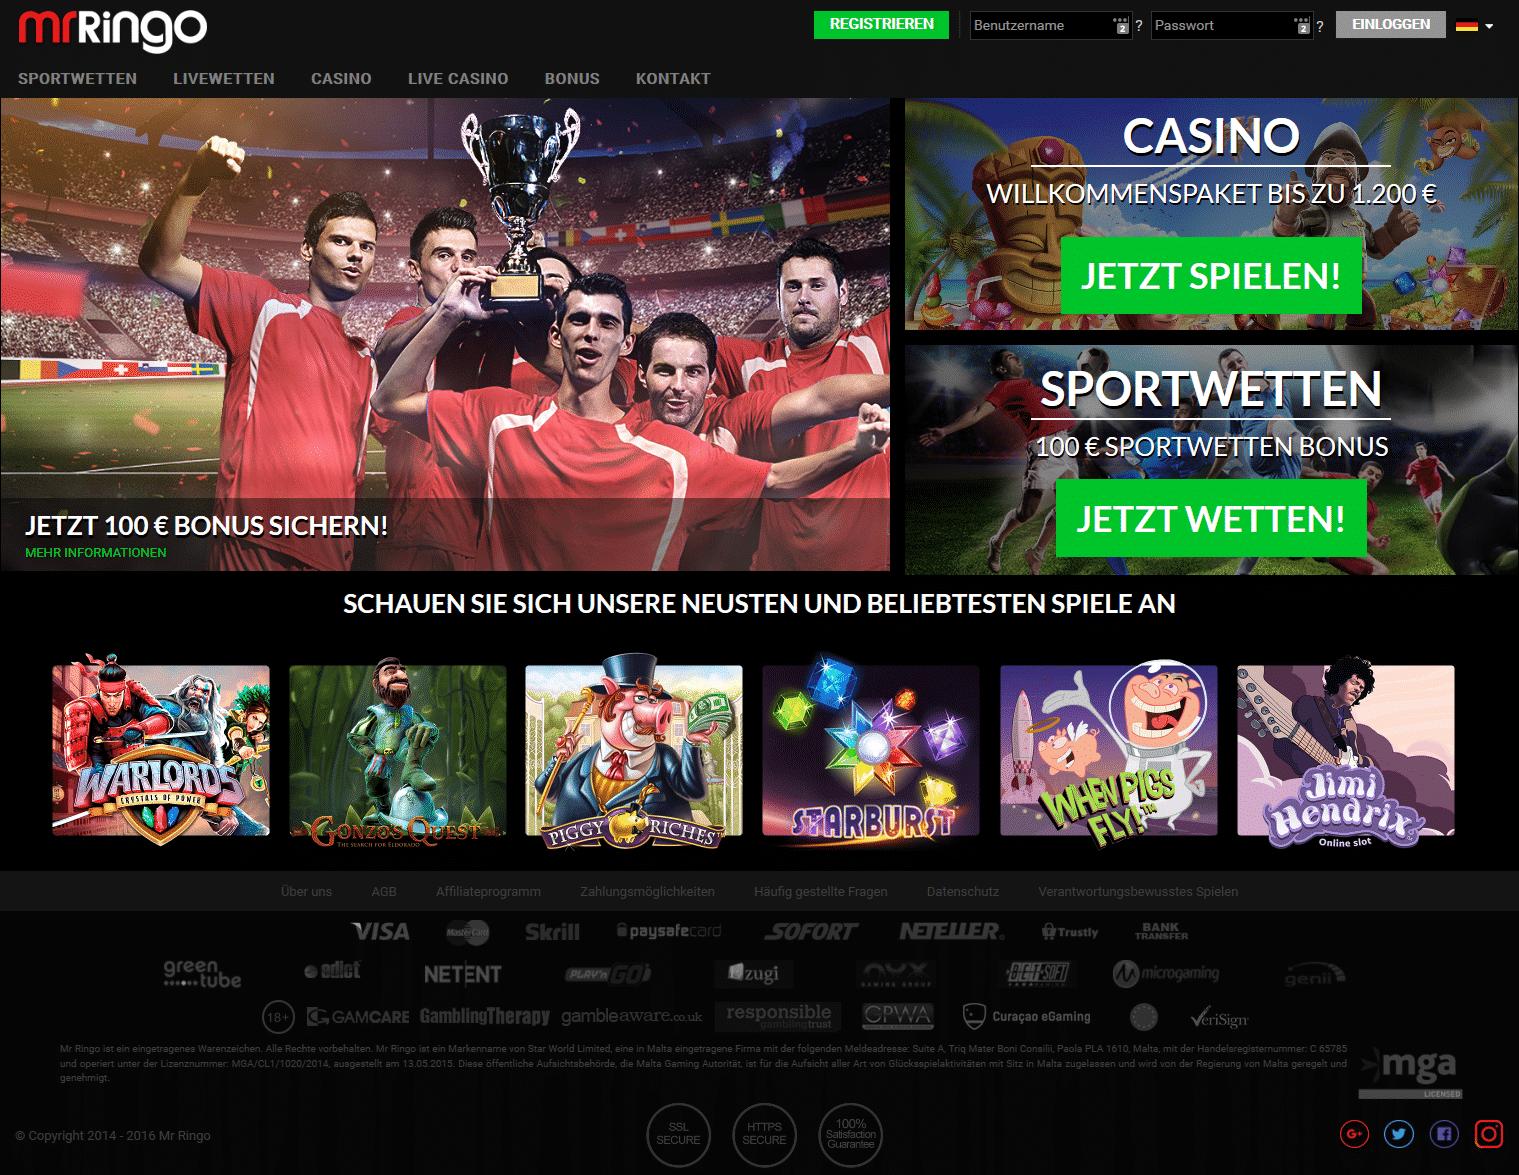 Casino Mrringo Bild